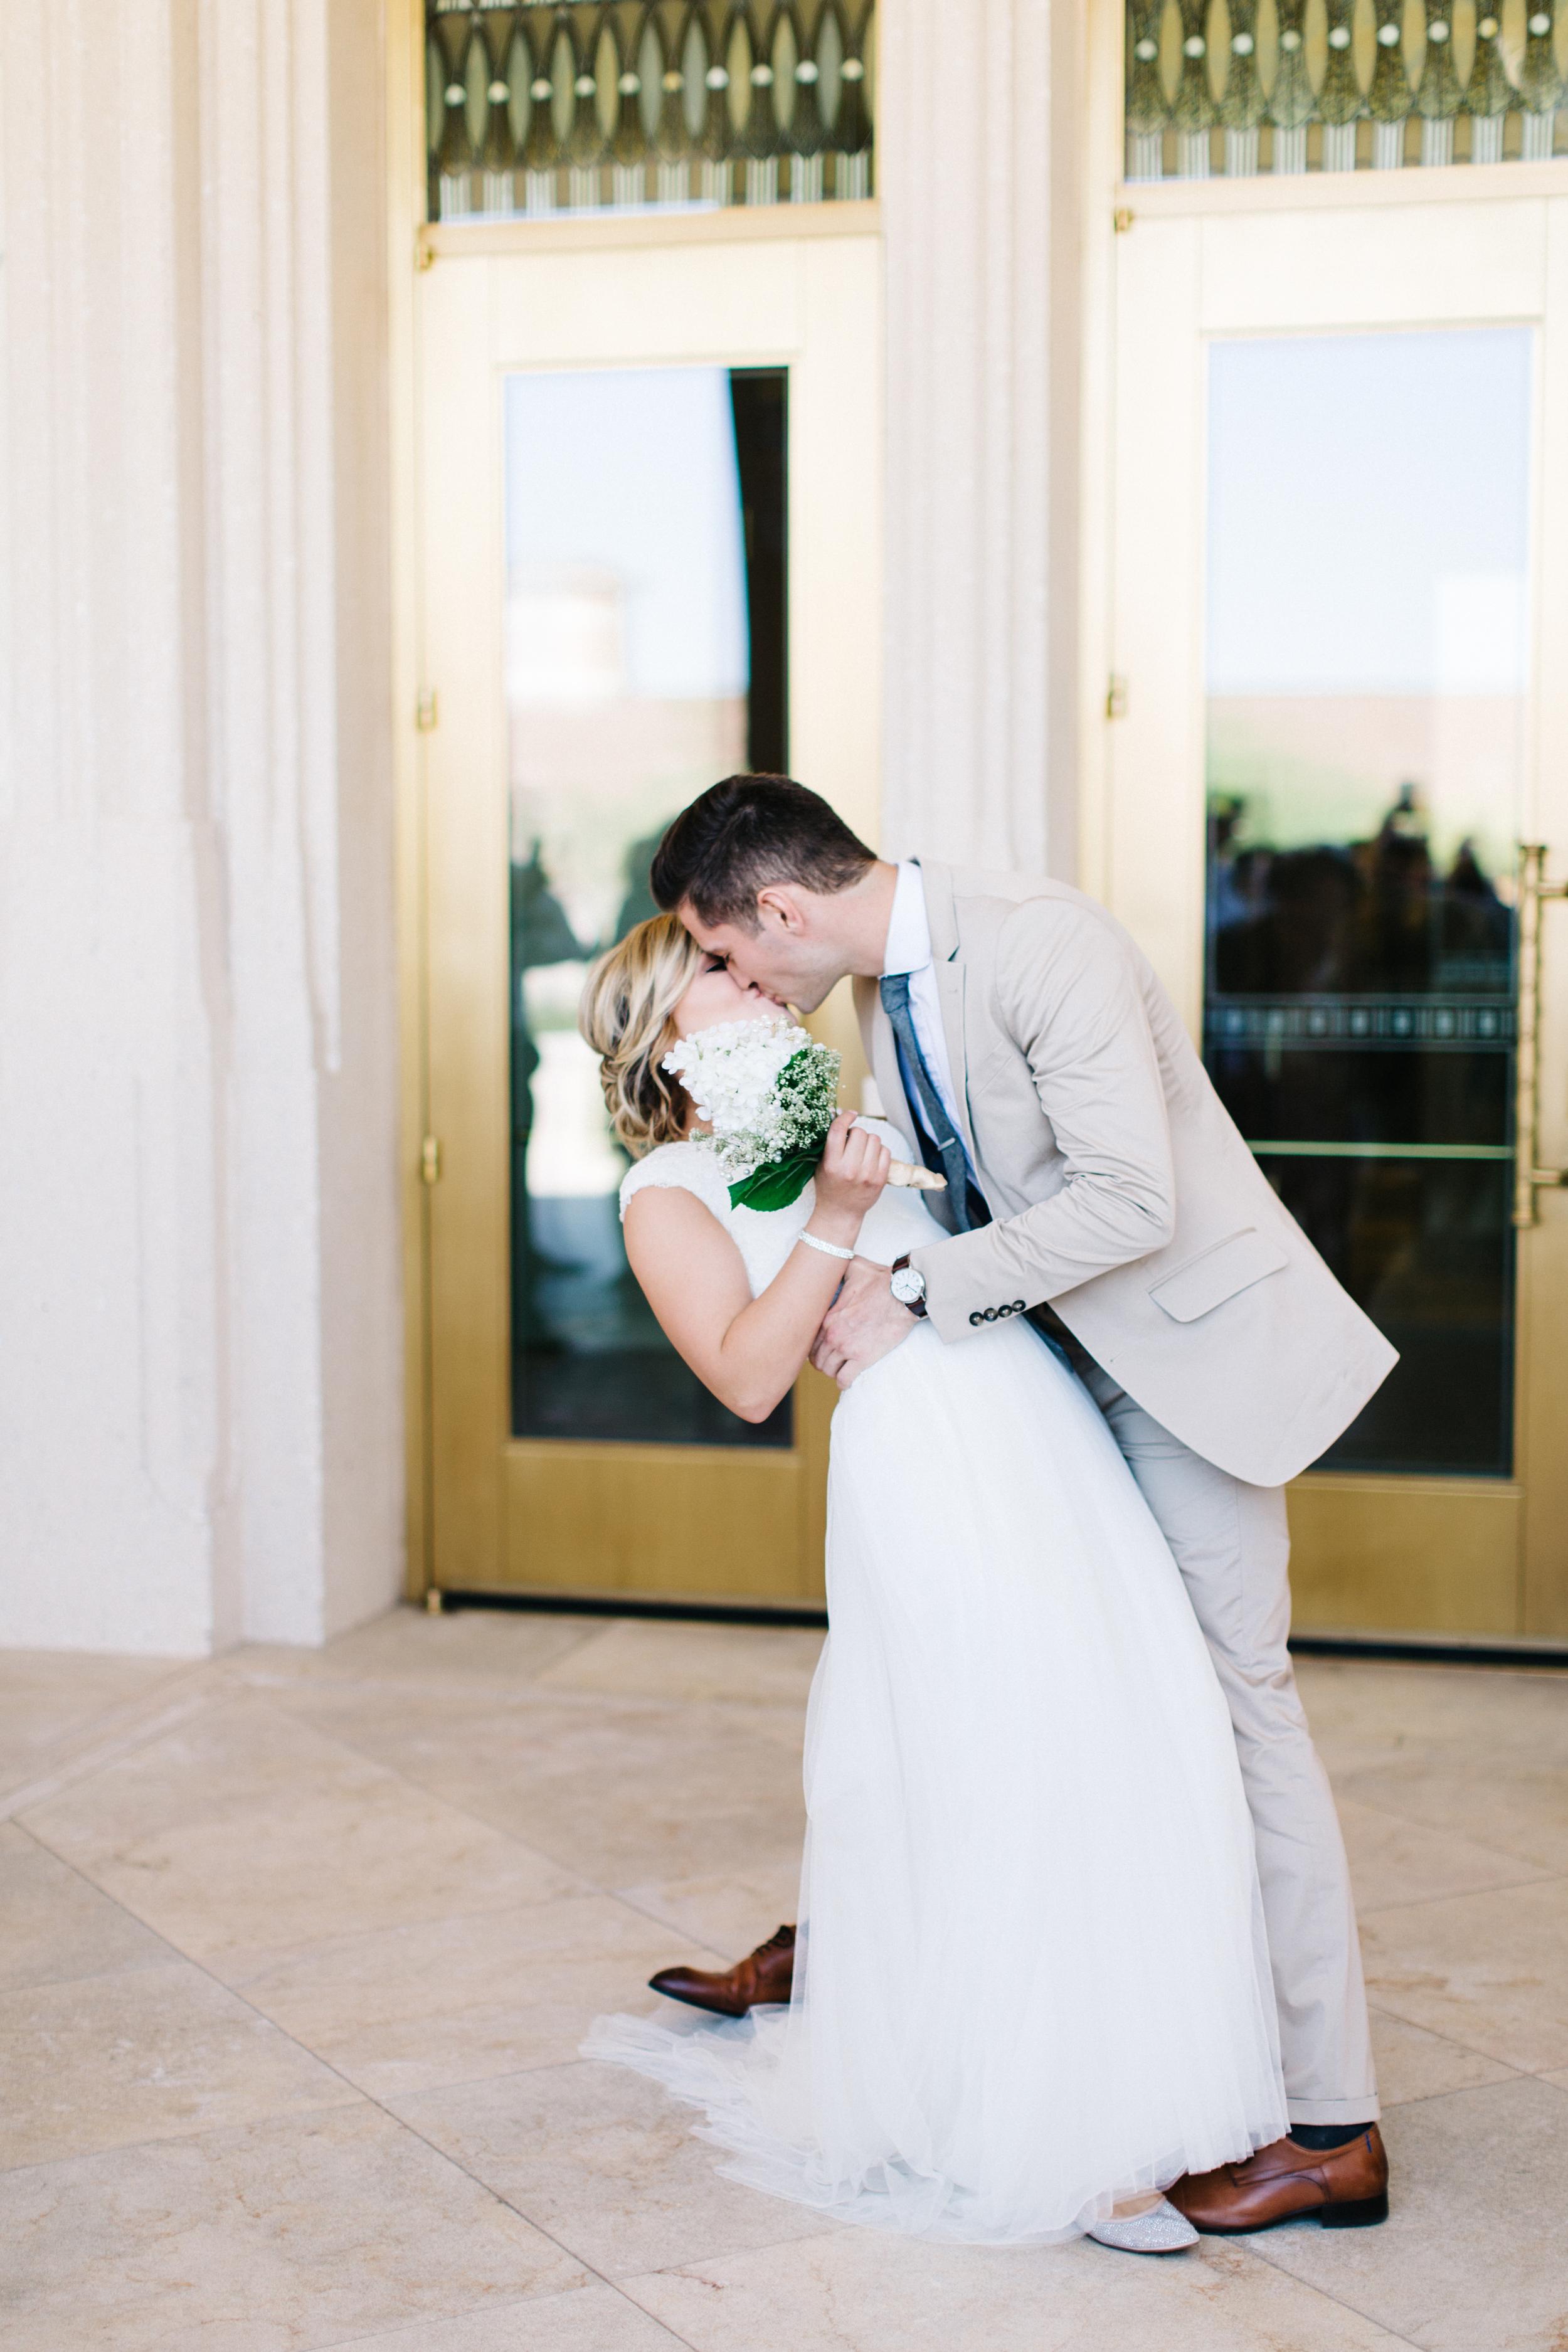 KennedyWyatt_WeddingDay-15.jpg